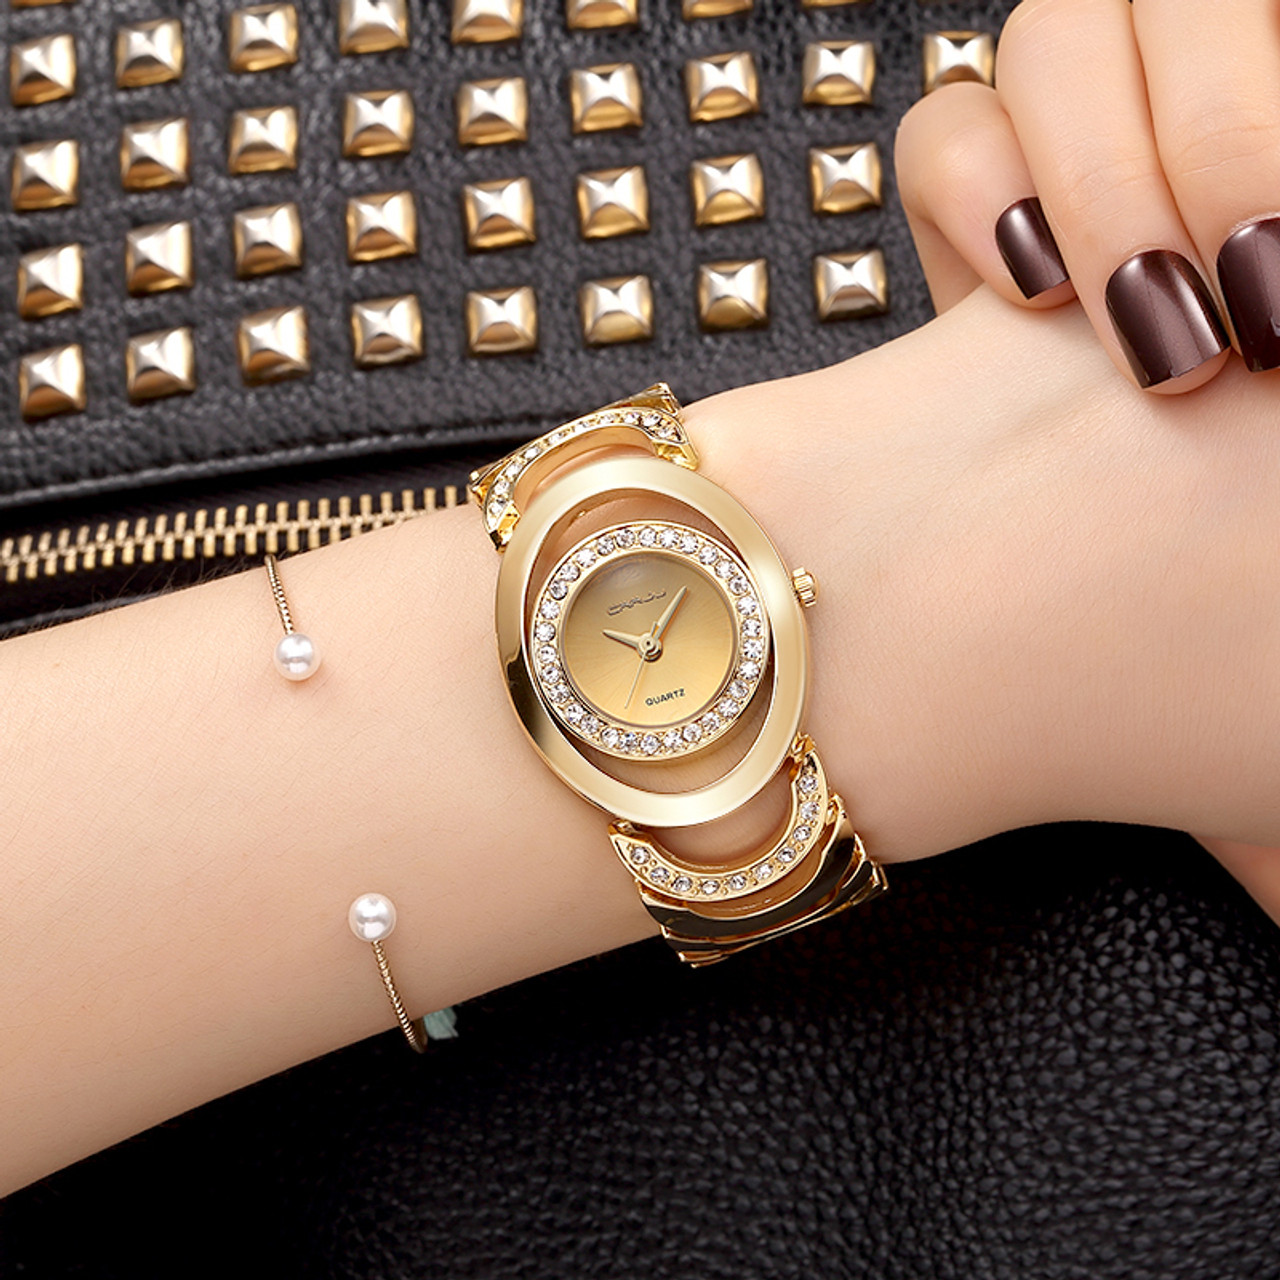 Crrju Luxury Women Watch Famous Brands Gold Fashion Design Bracelet Watches Ladies Women Wrist Watches Relogio Femininos Onshopdeals Com